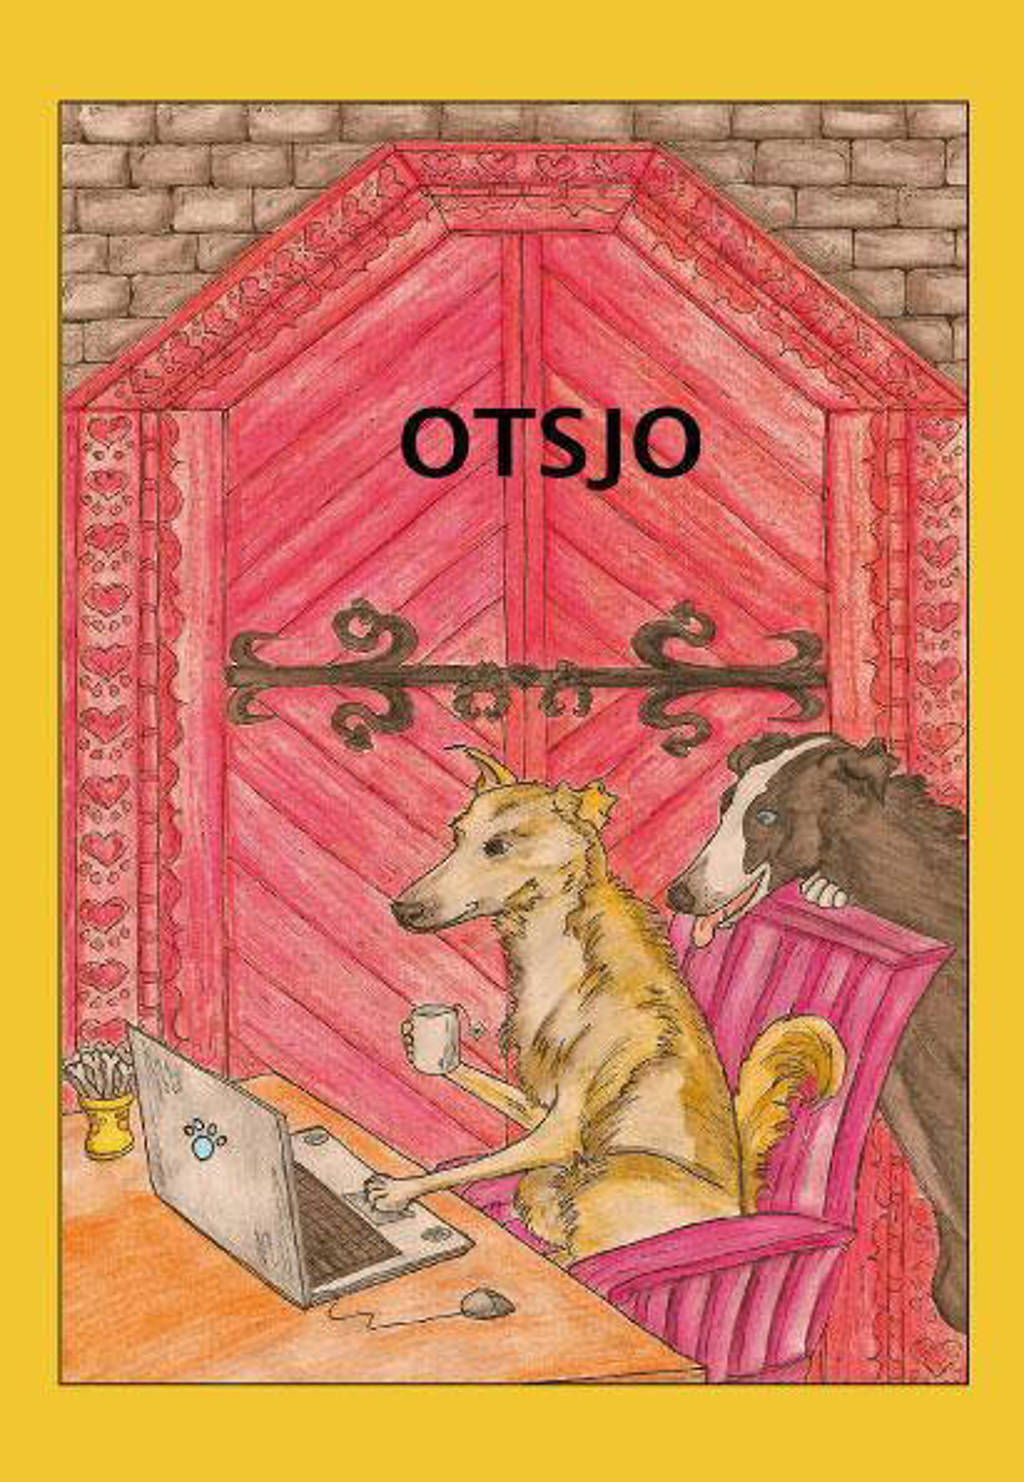 Otsjo - Kyte